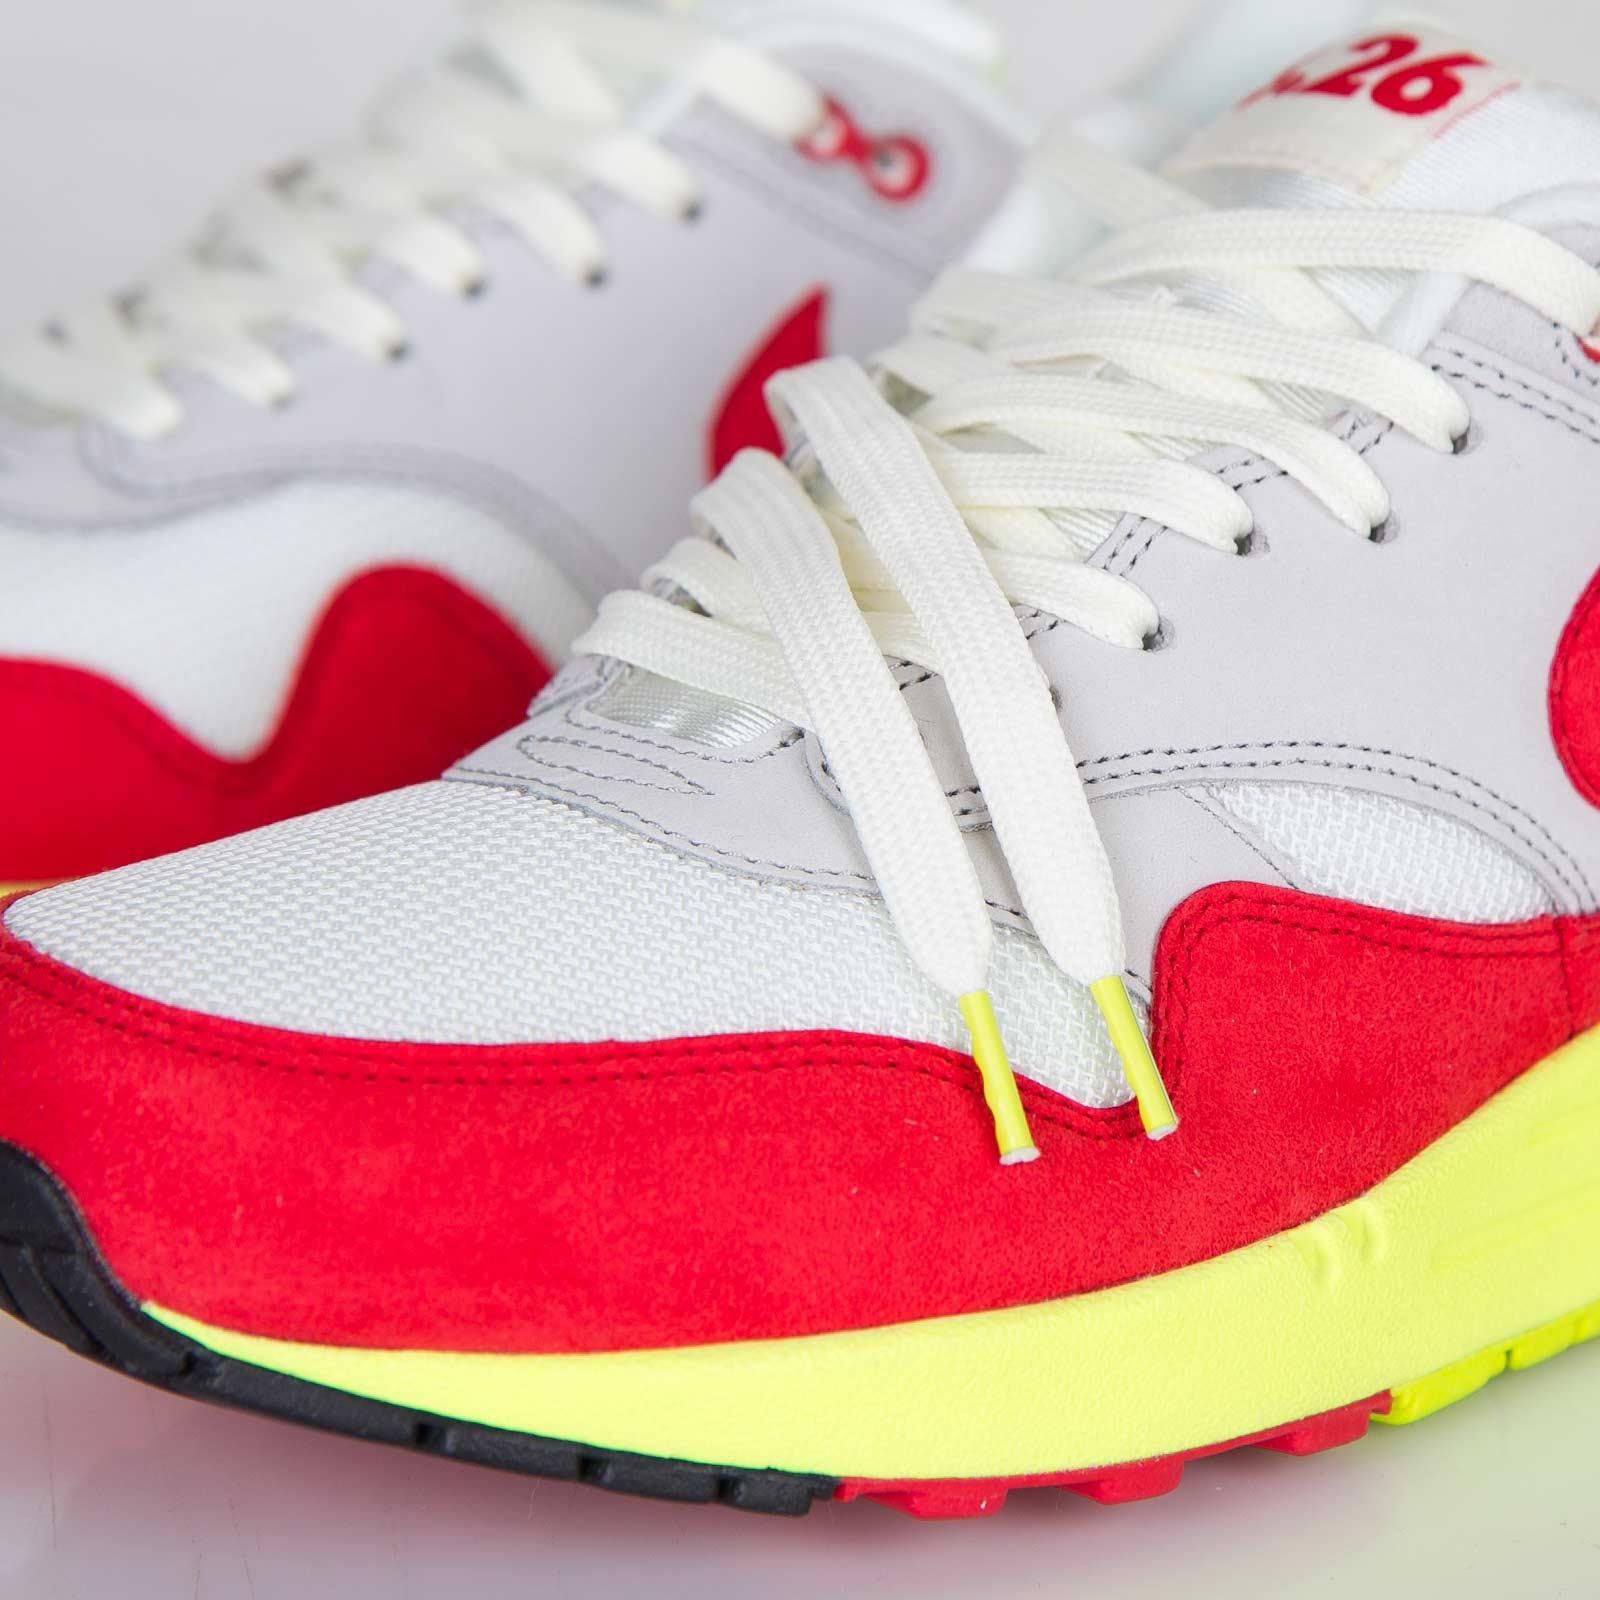 a703869f9e Nike Air Max 1 Premium QS - 665873-106 - Sneakersnstuff | sneakers ...